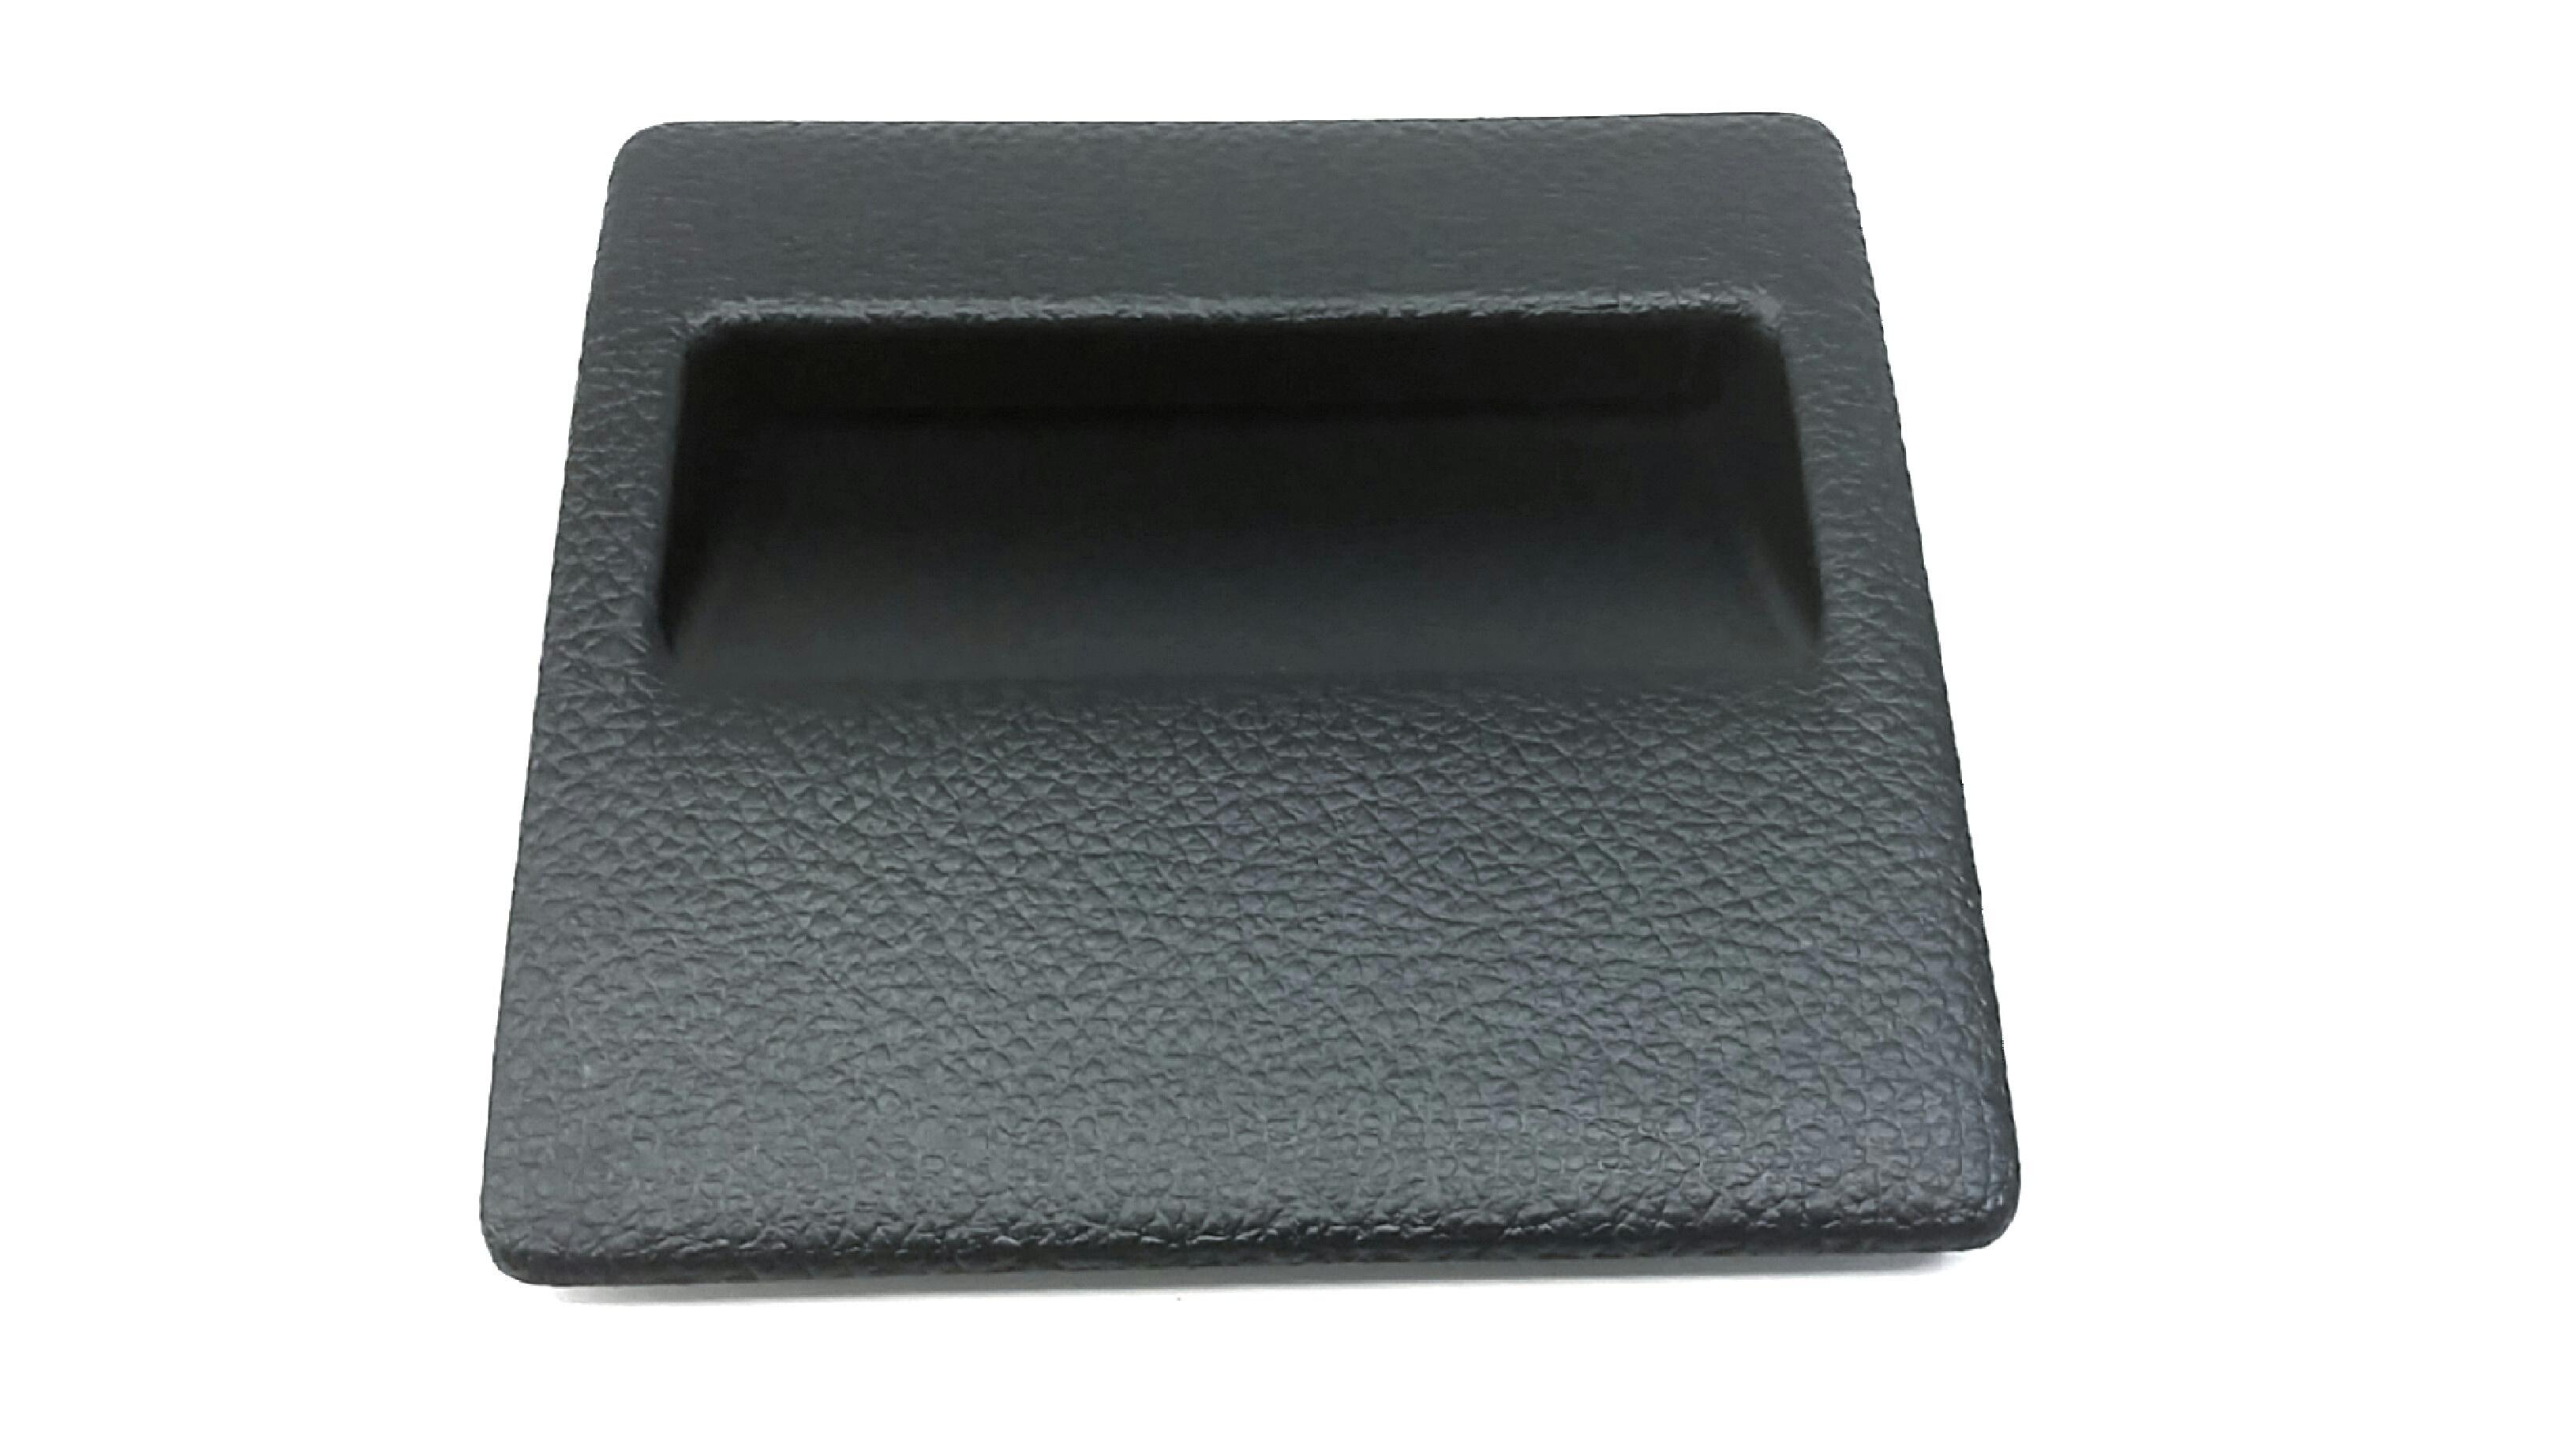 66135AJ00AVH - Fuse Box Cover (Black) - Genuine Subaru Part